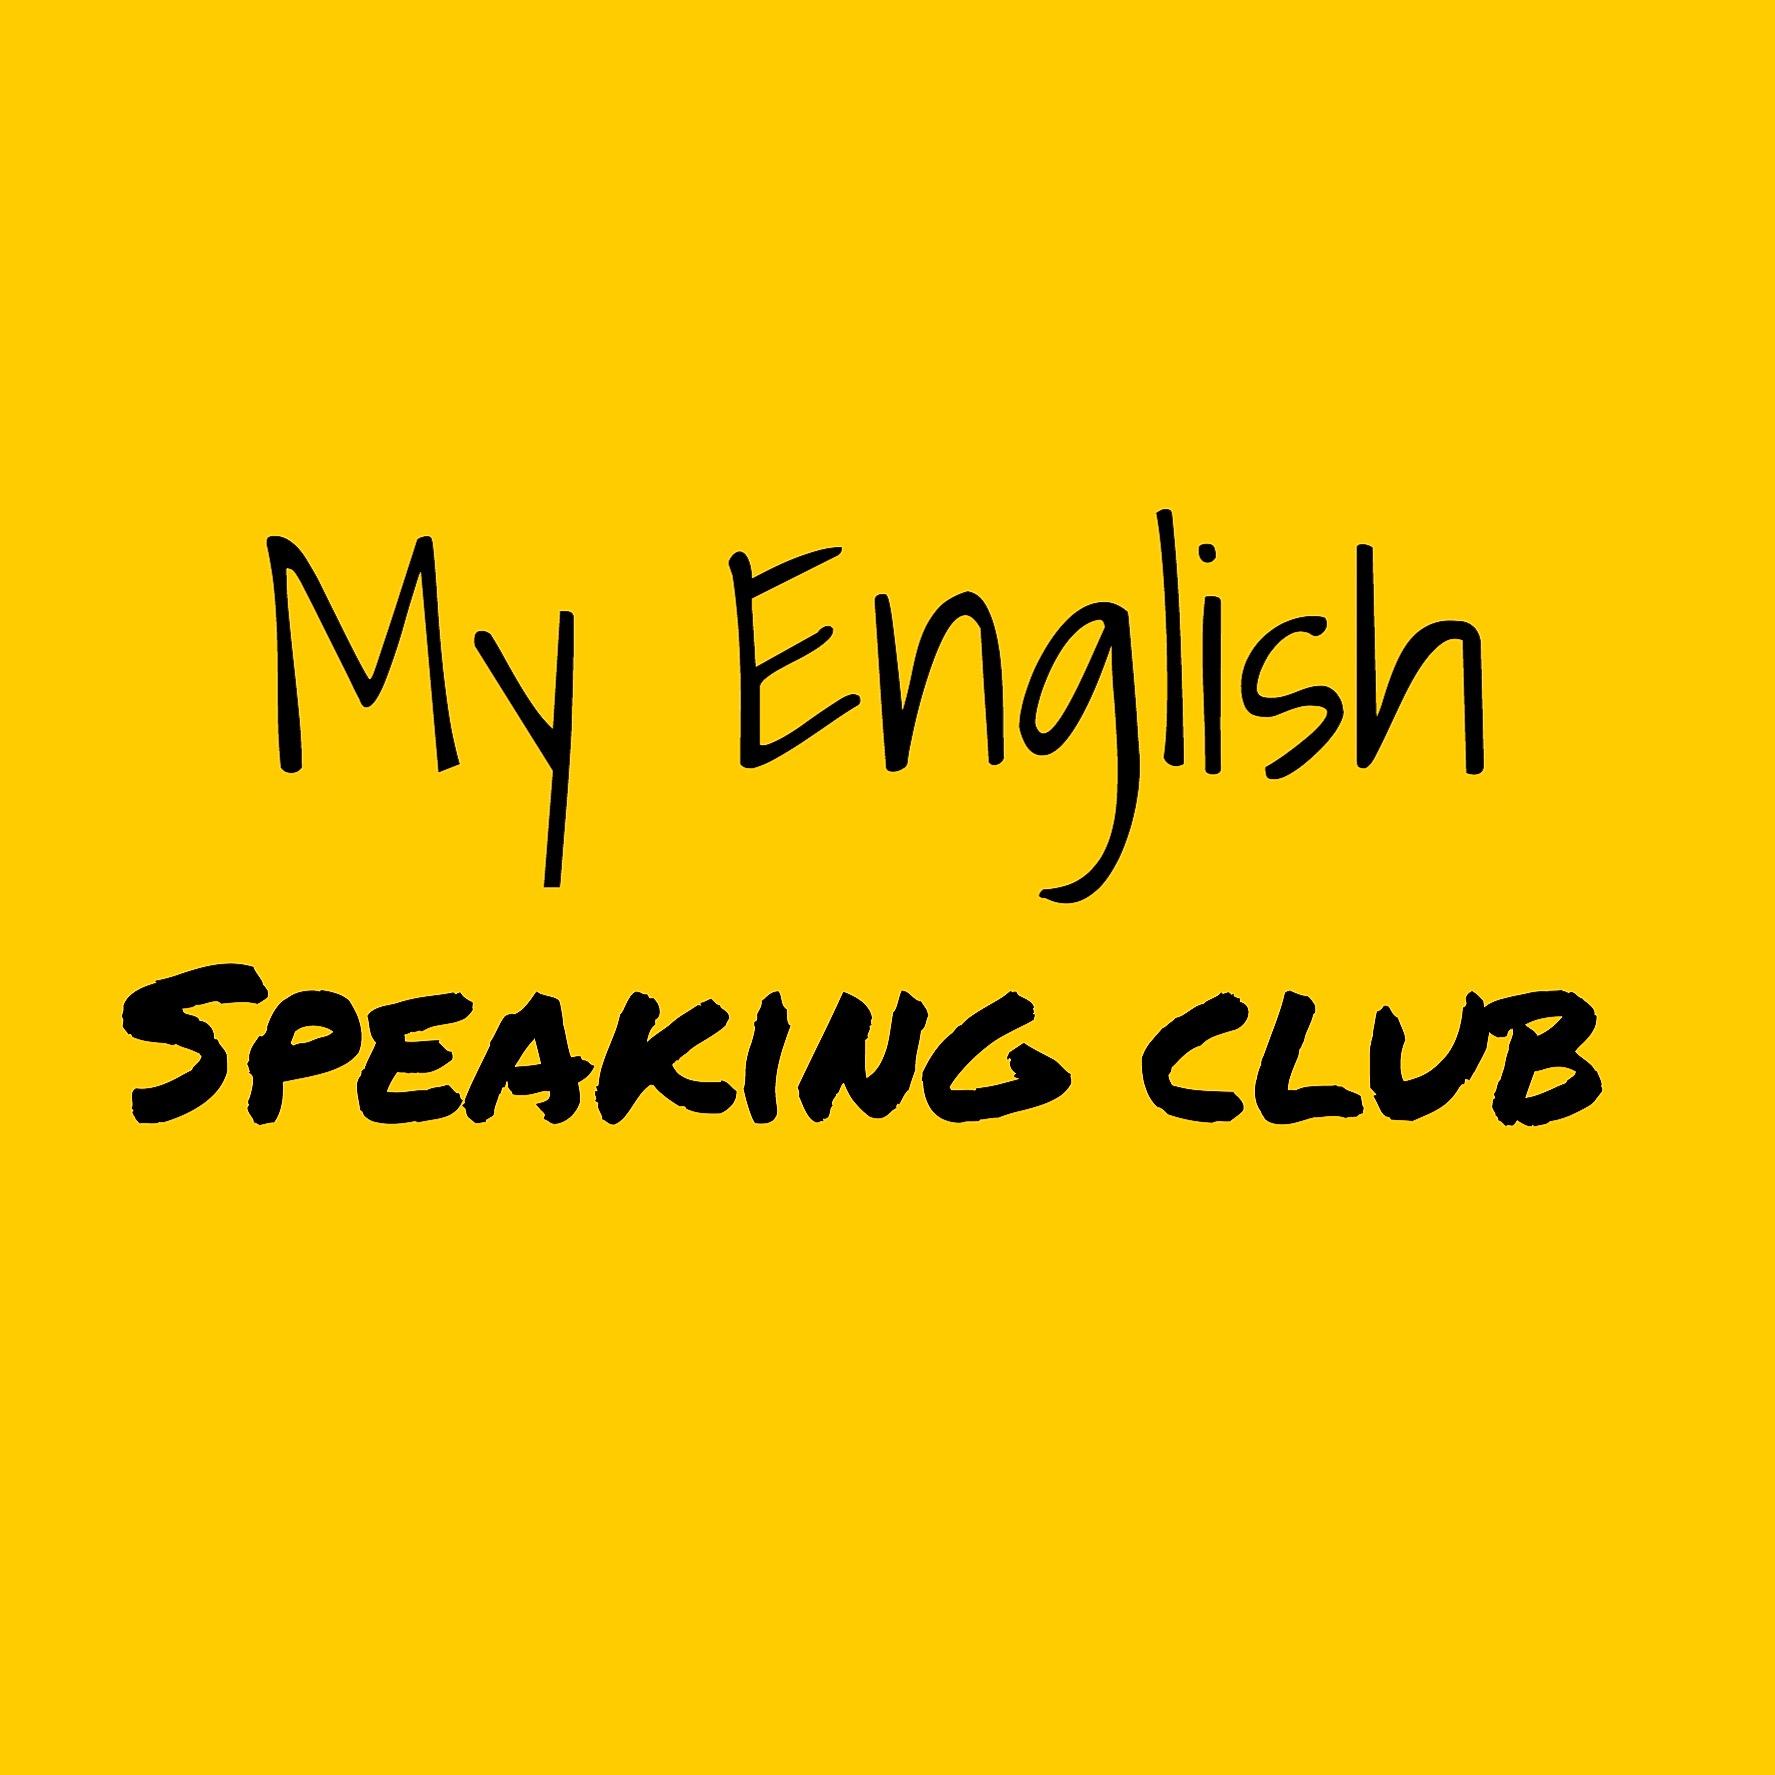 My English Speaking Club